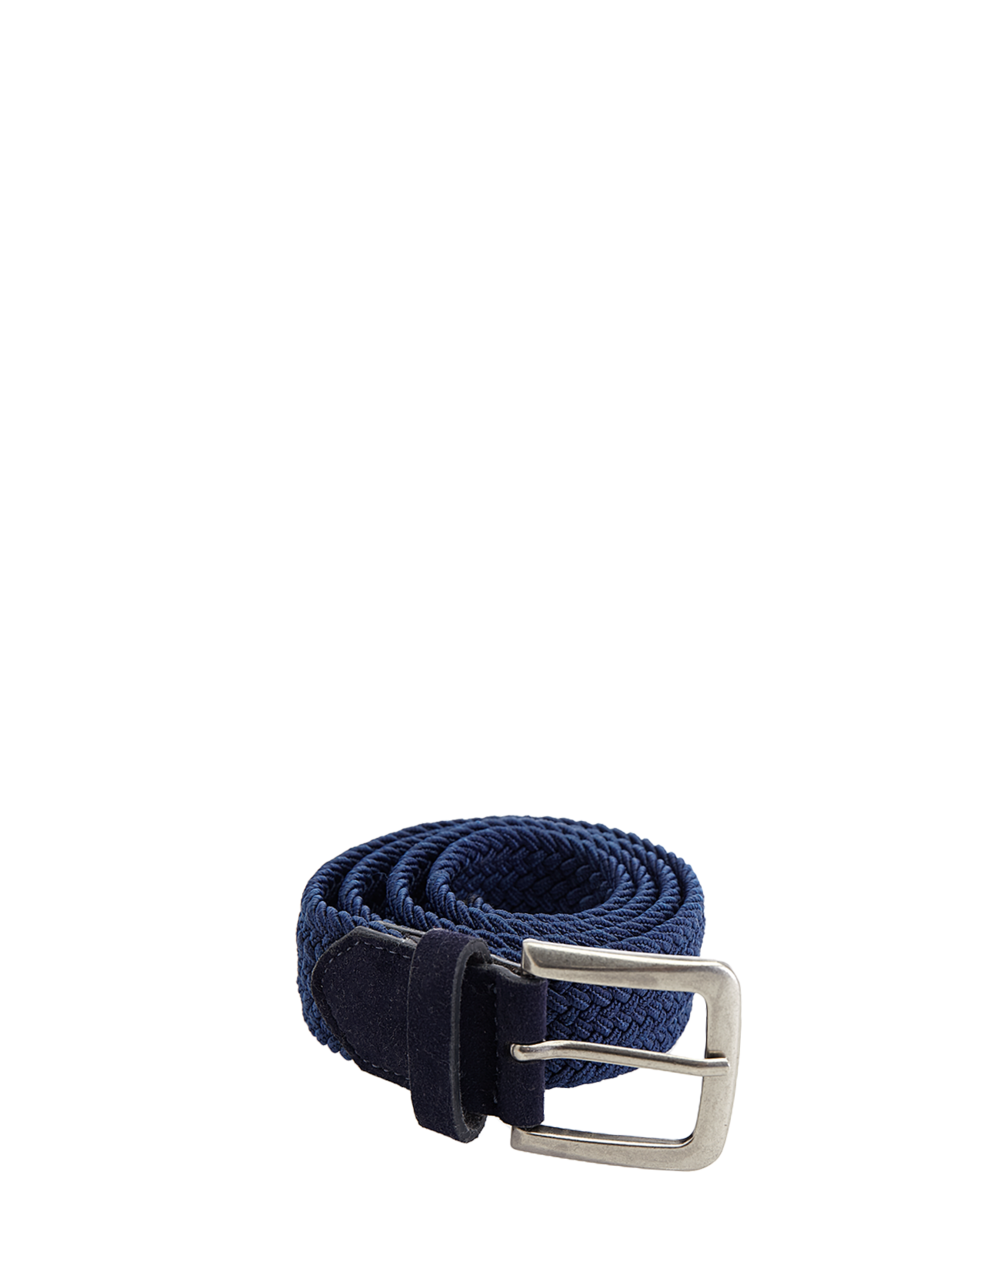 StradivariusMan_accessories (62).png